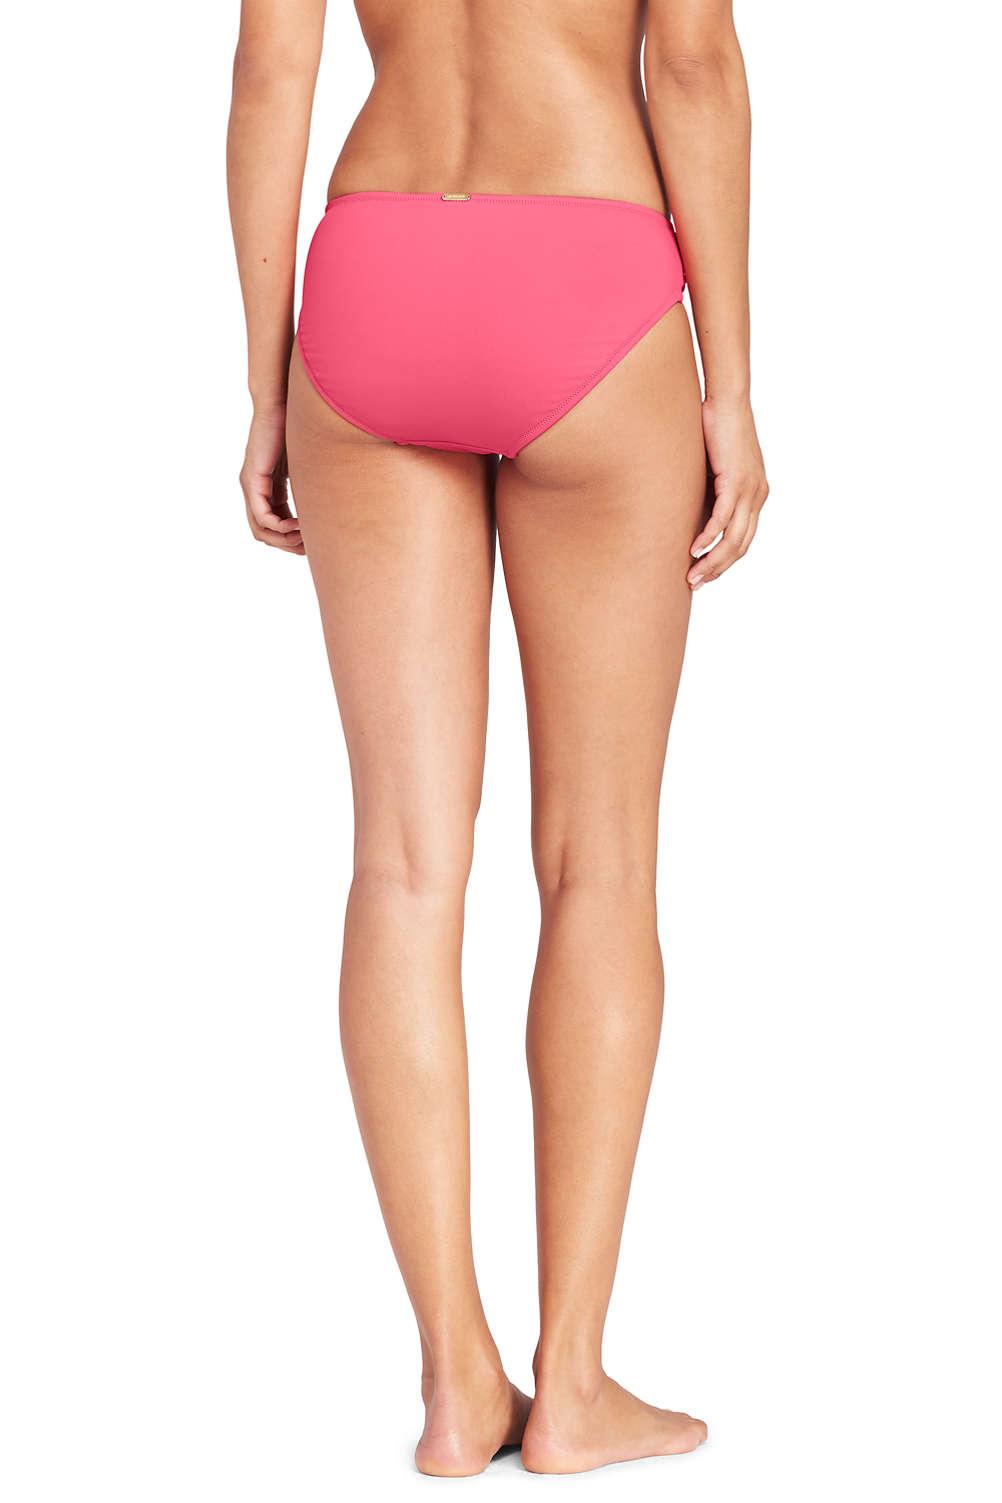 51c19dc4f1 Women's Wrap Mid Waist Bikini Bottoms from Lands' End